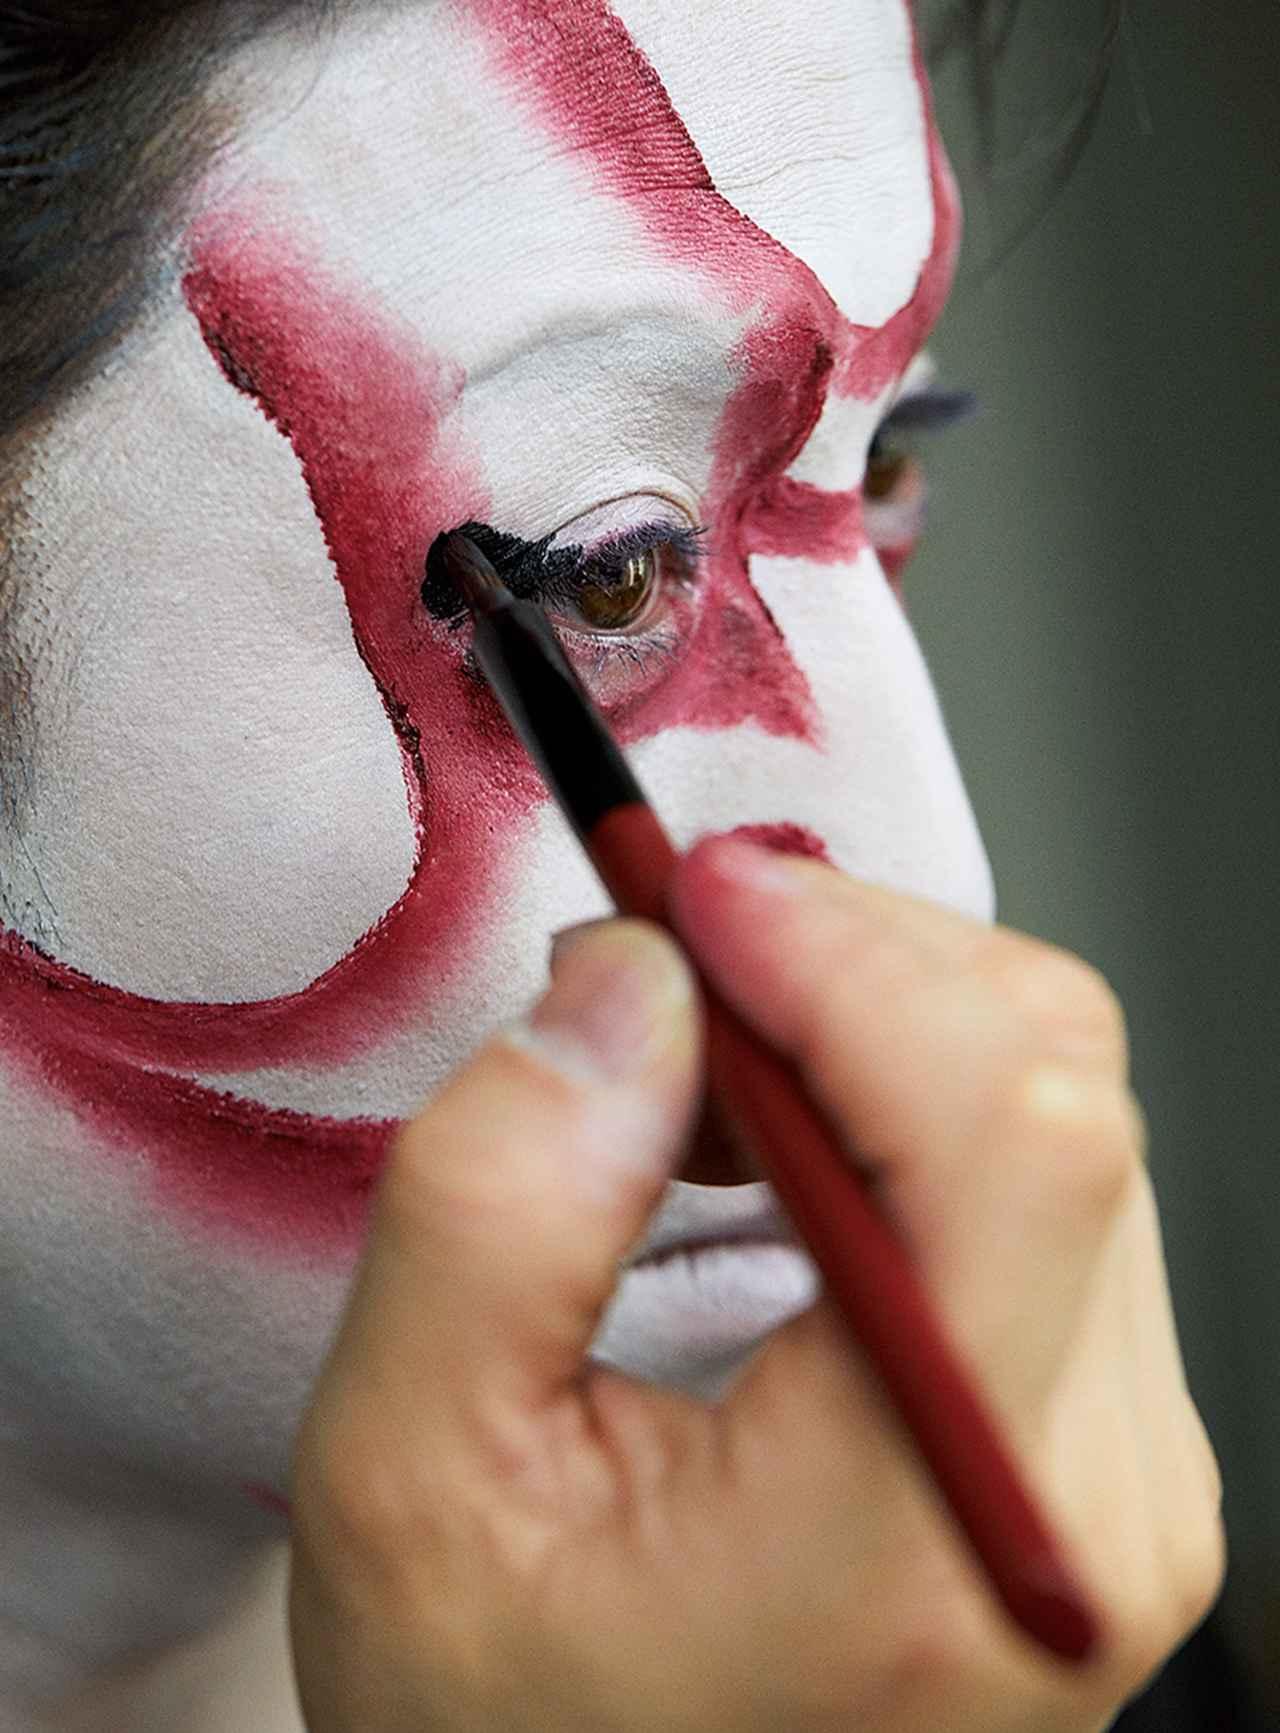 Images : 4番目の画像 - 「松本幸四郎の 歌舞伎メイク進化論」のアルバム - T JAPAN:The New York Times Style Magazine 公式サイト